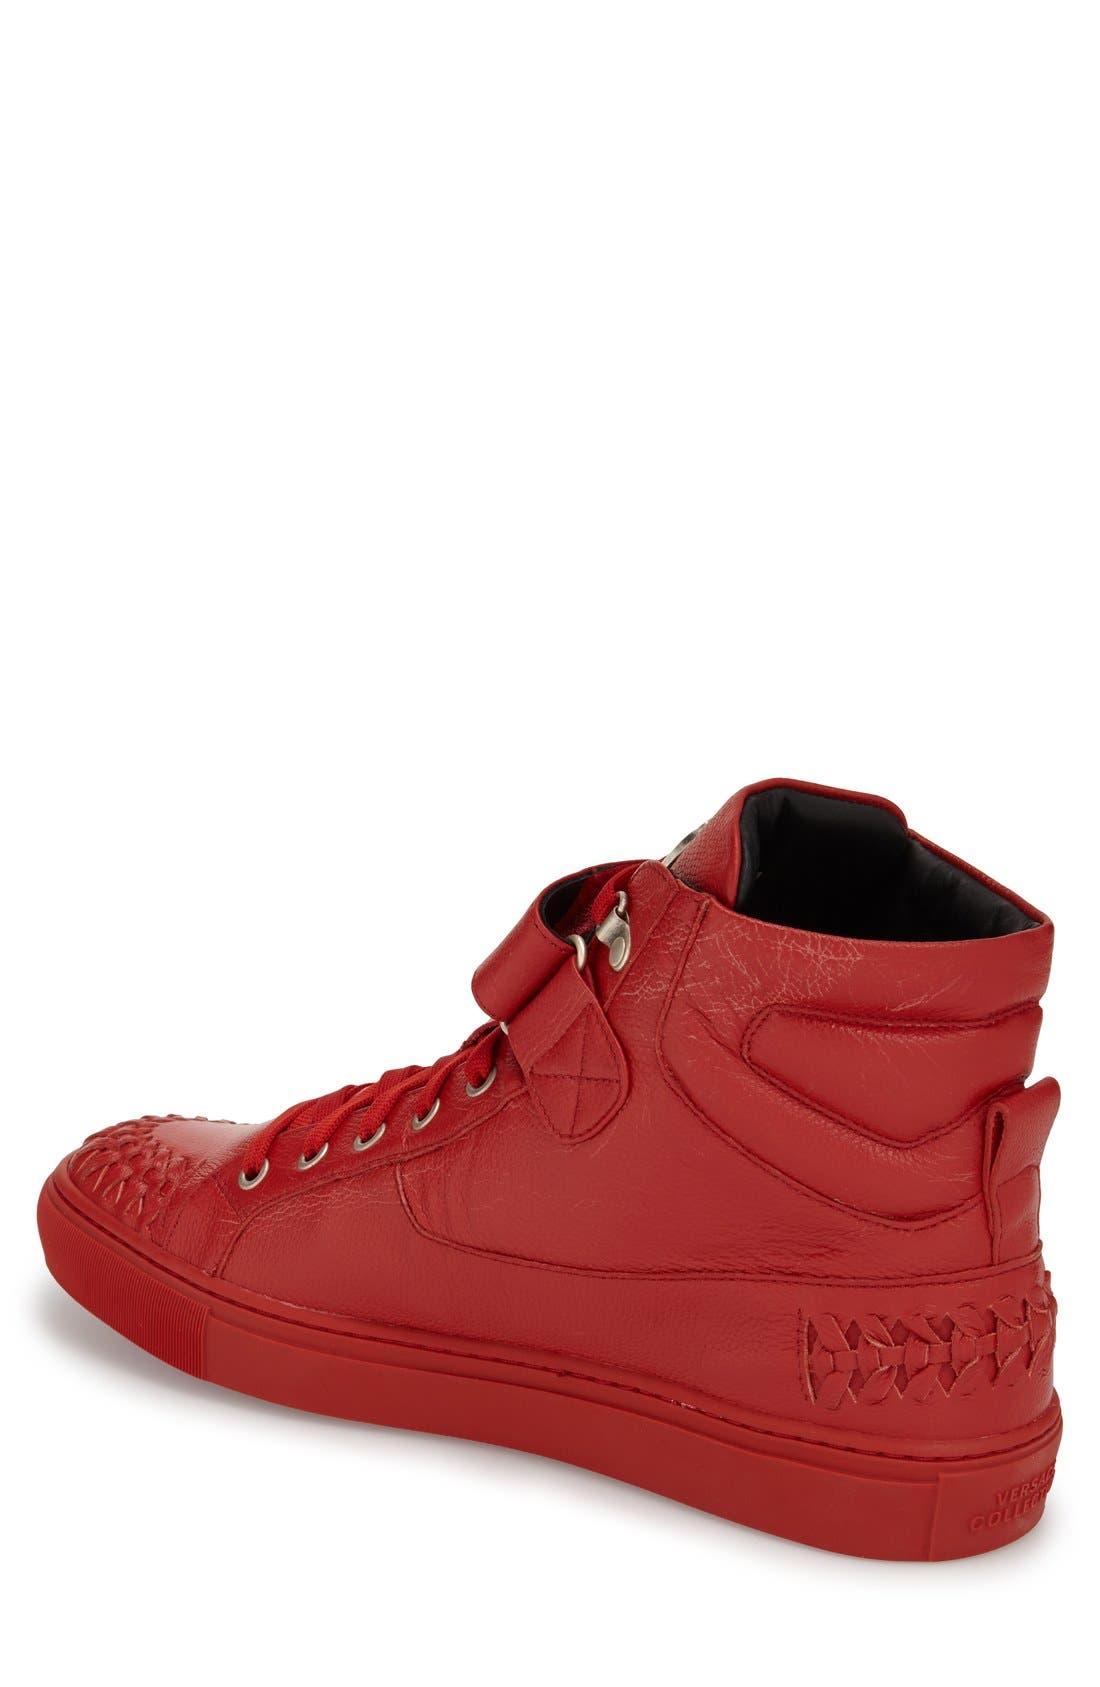 VERSACE COLLECTION, Woven High Top Sneaker, Alternate thumbnail 2, color, 600